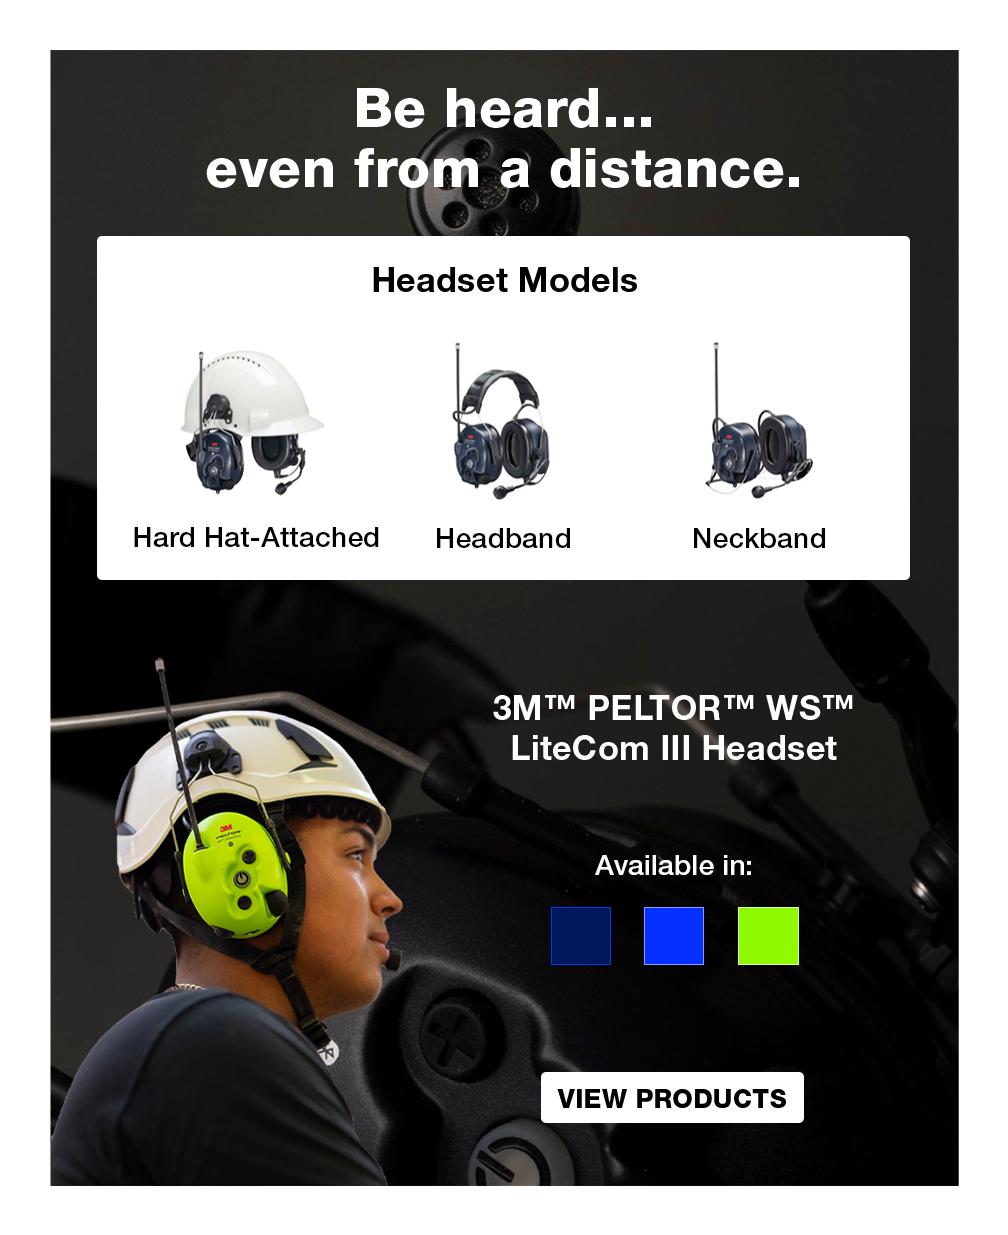 3M™ PELTOR™ WS™ LiteCom Pro III Headset